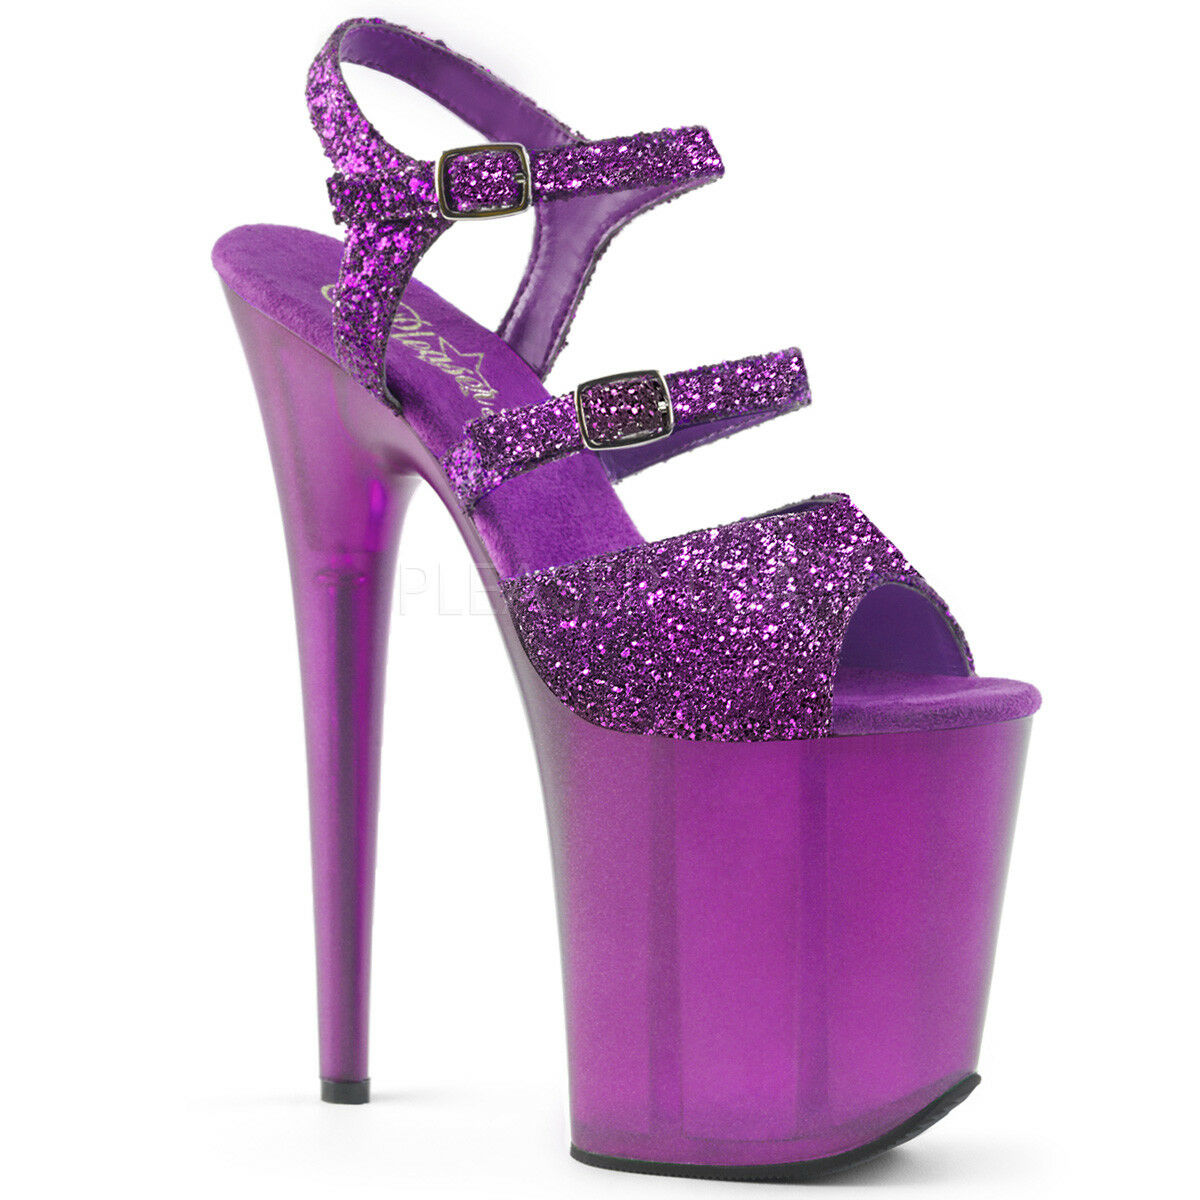 Pleaser FLAMINGO-874 Women's Purple Glitter Glitter Glitter Frosted Platform Ankle Strap Sandals 7c5cbe